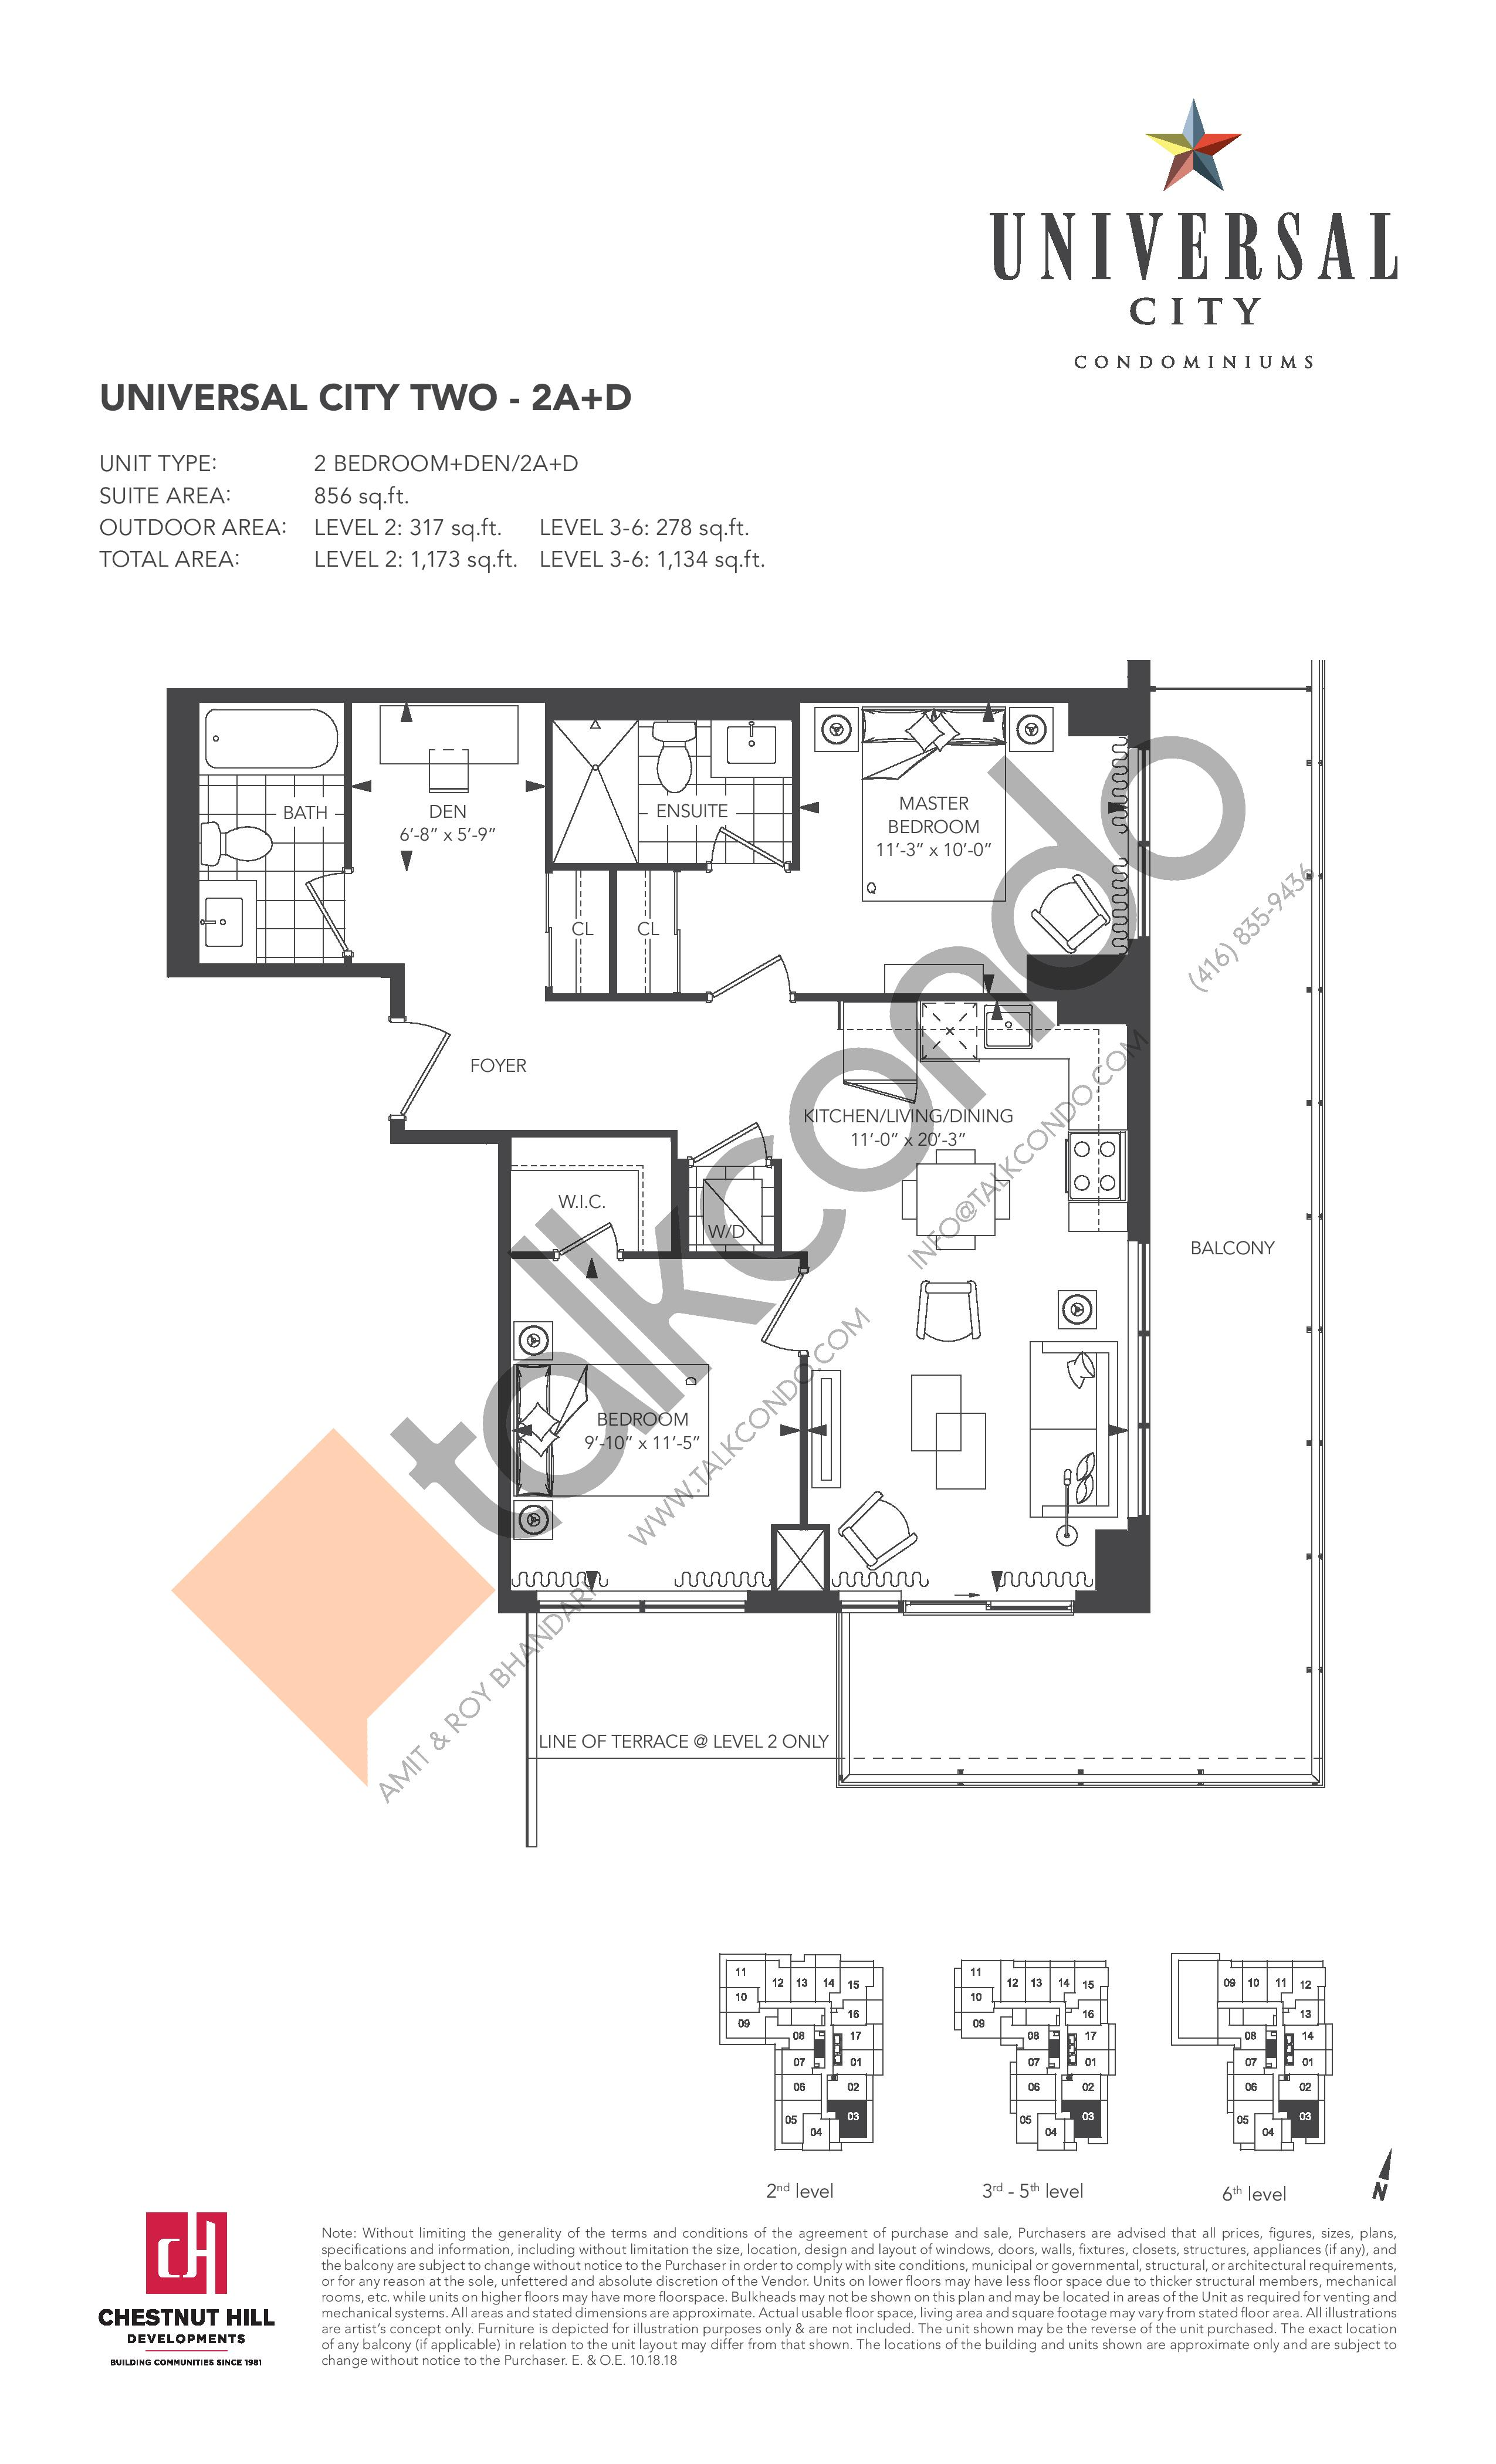 2A+D Floor Plan at Universal City 2 Condos - 856 sq.ft